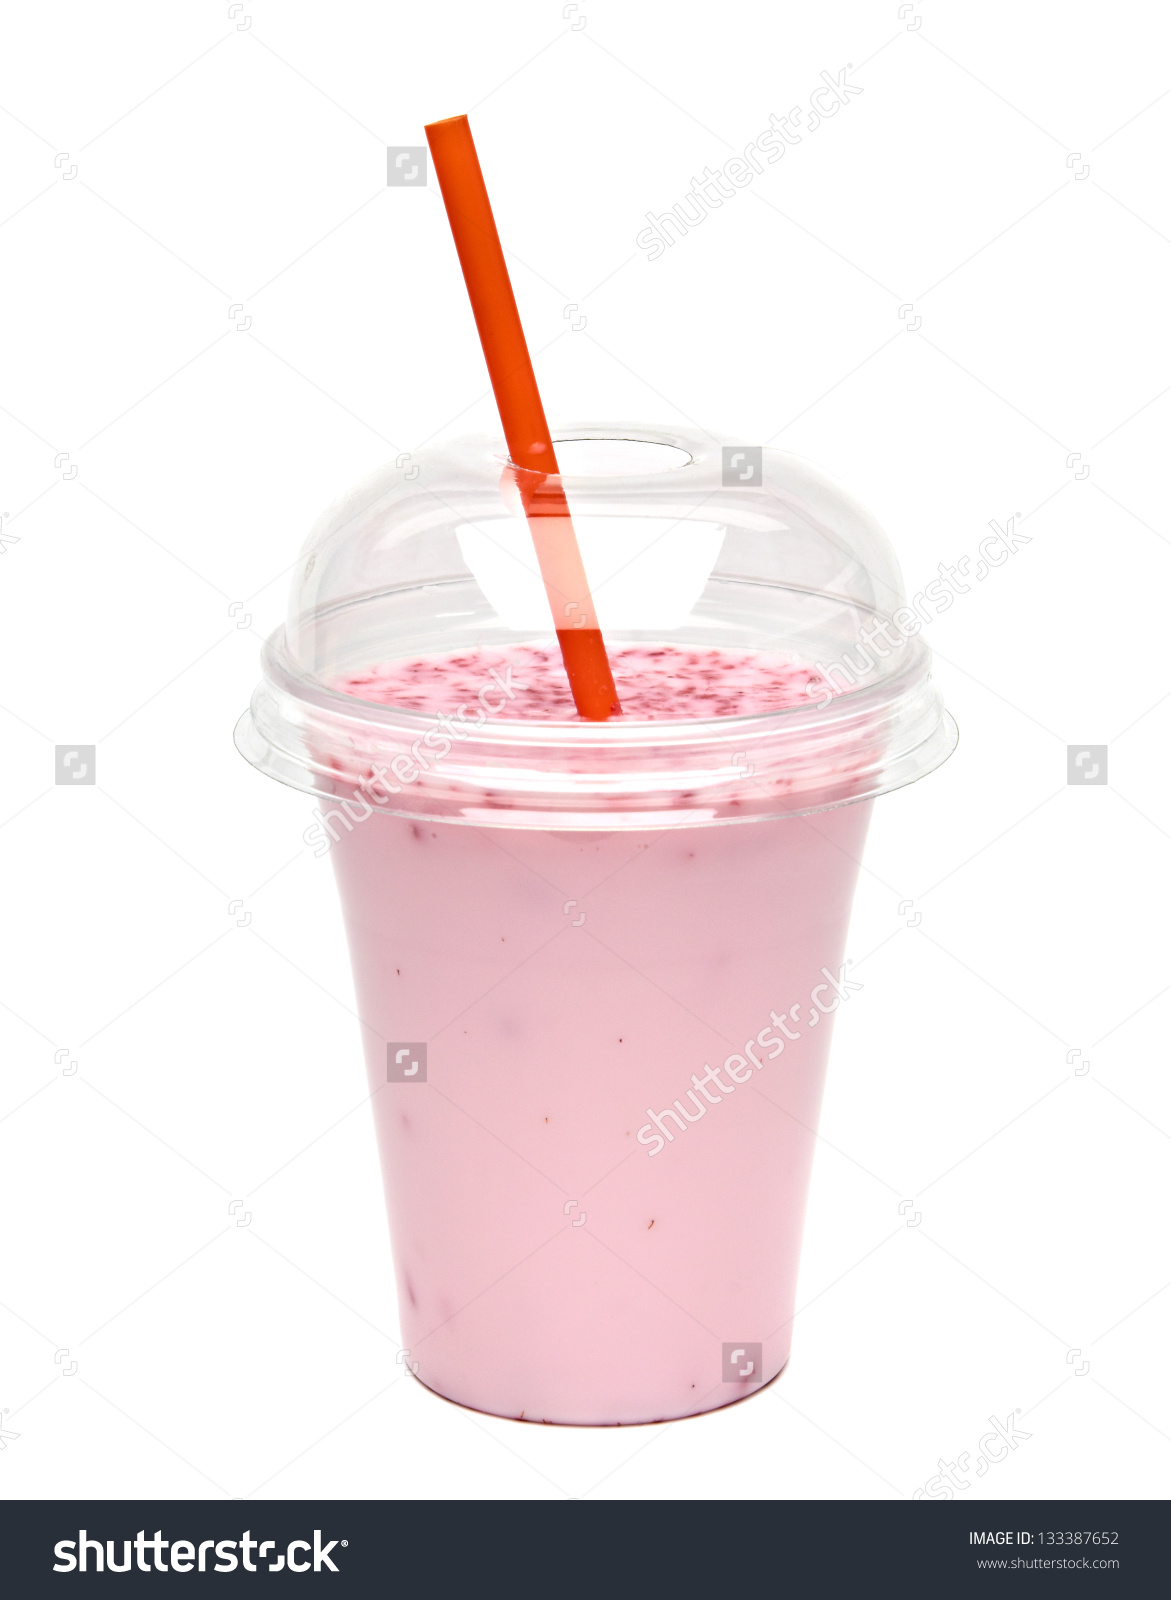 Raspberry Milkshake Take Away Cup Isolated Stock Photo 133387652.